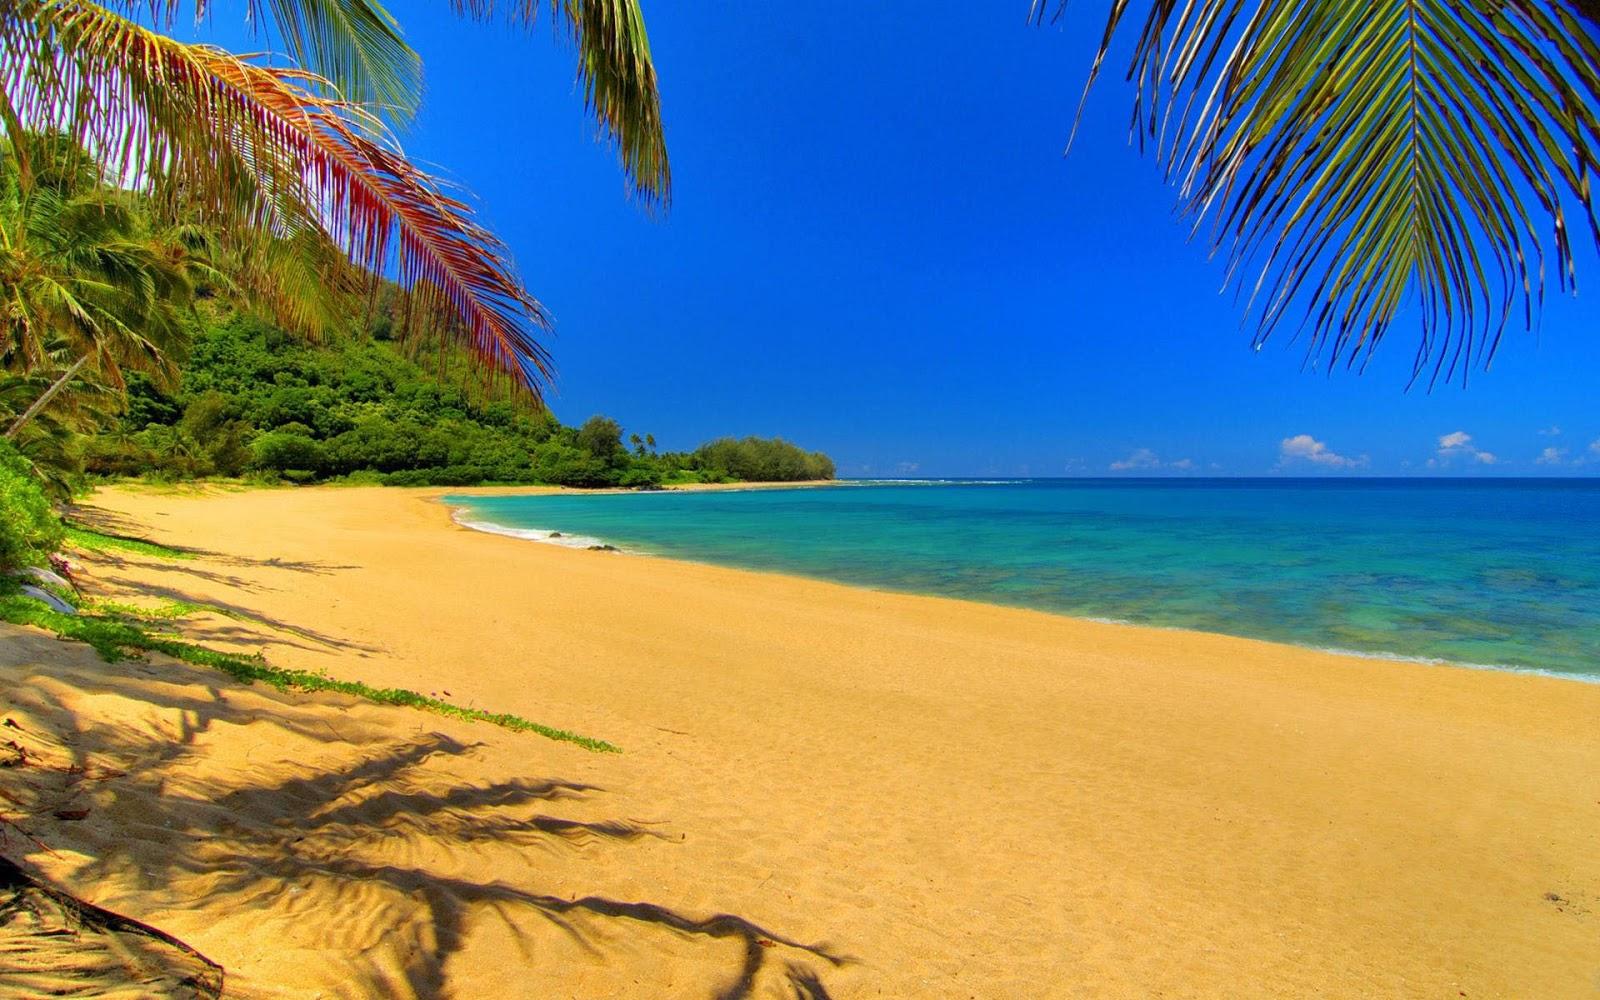 Gl Beach Kauai Hawaii The Best Beaches In World